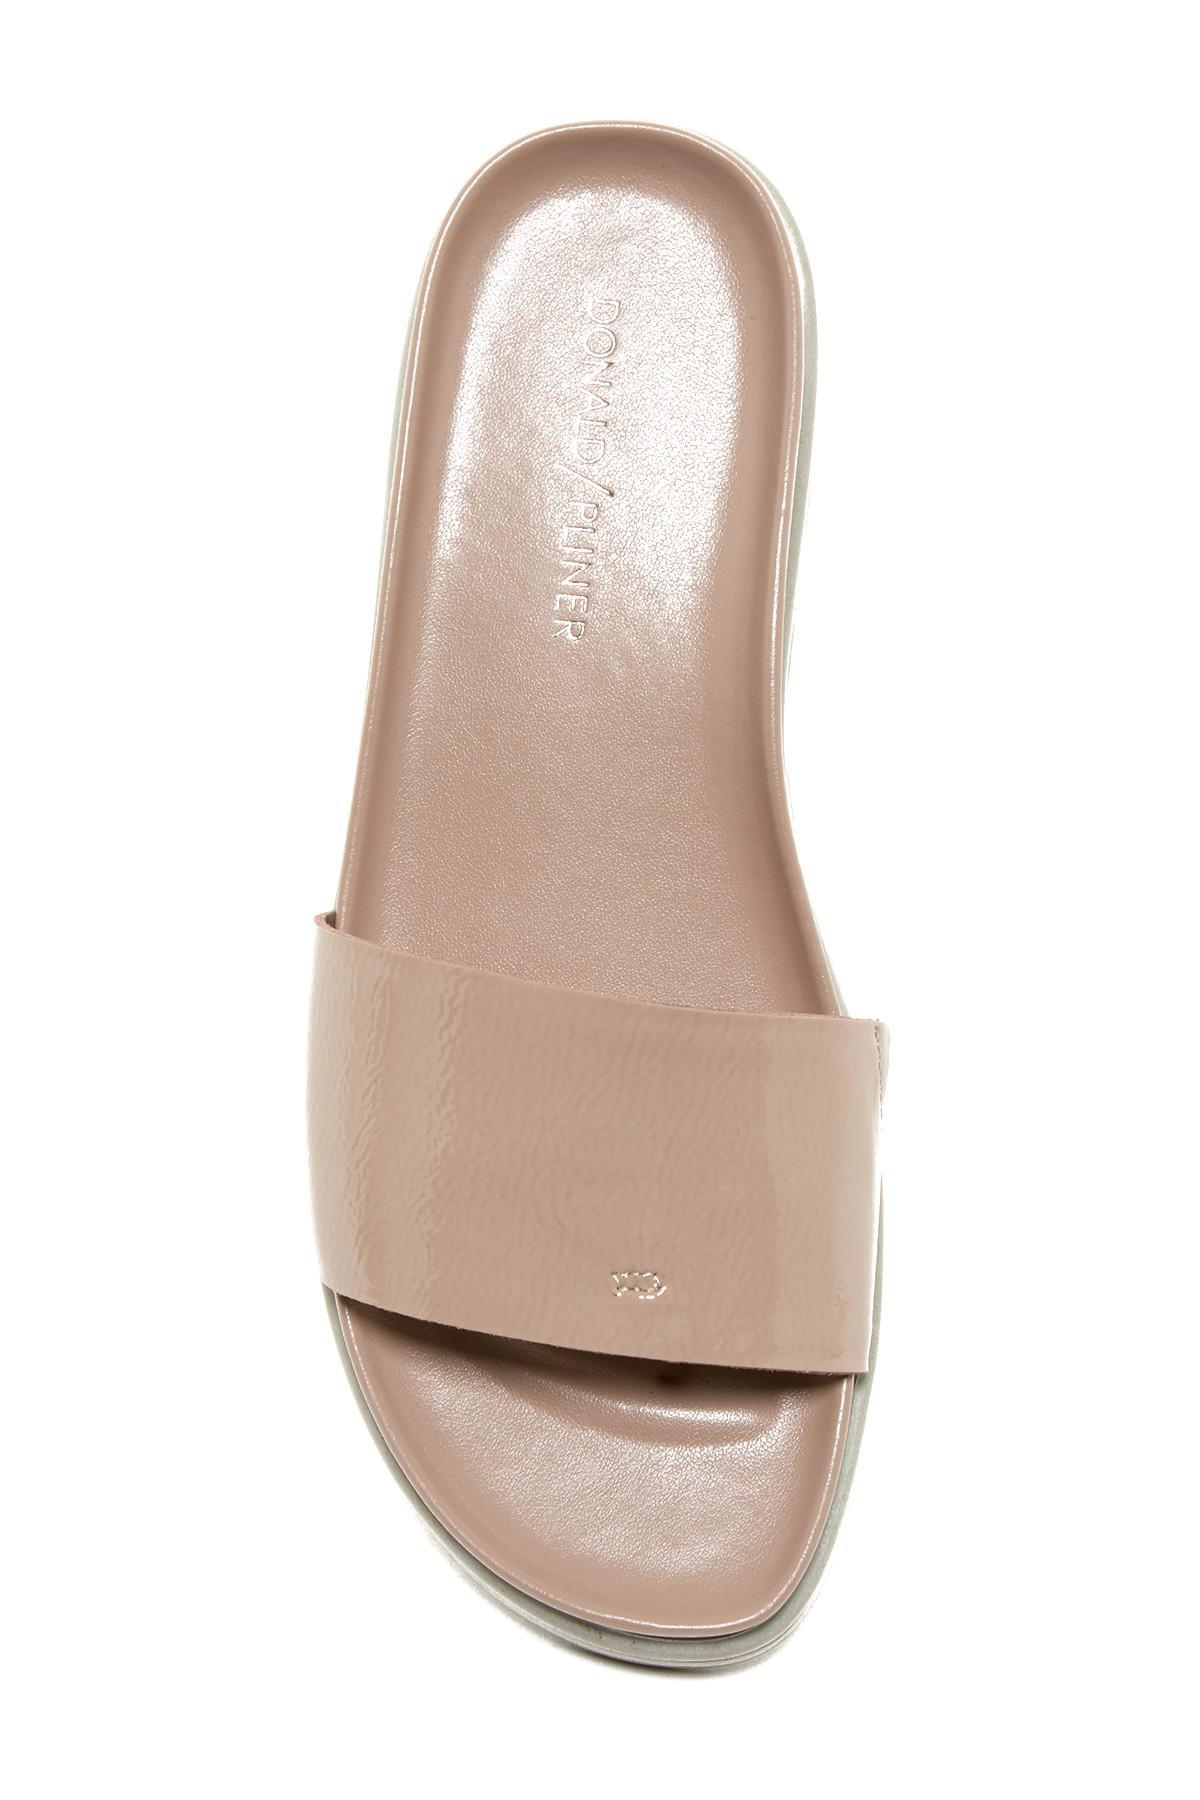 9eb88b2c94c Lyst - Donald J Pliner Fiji Platform Hidden Thong Sandal